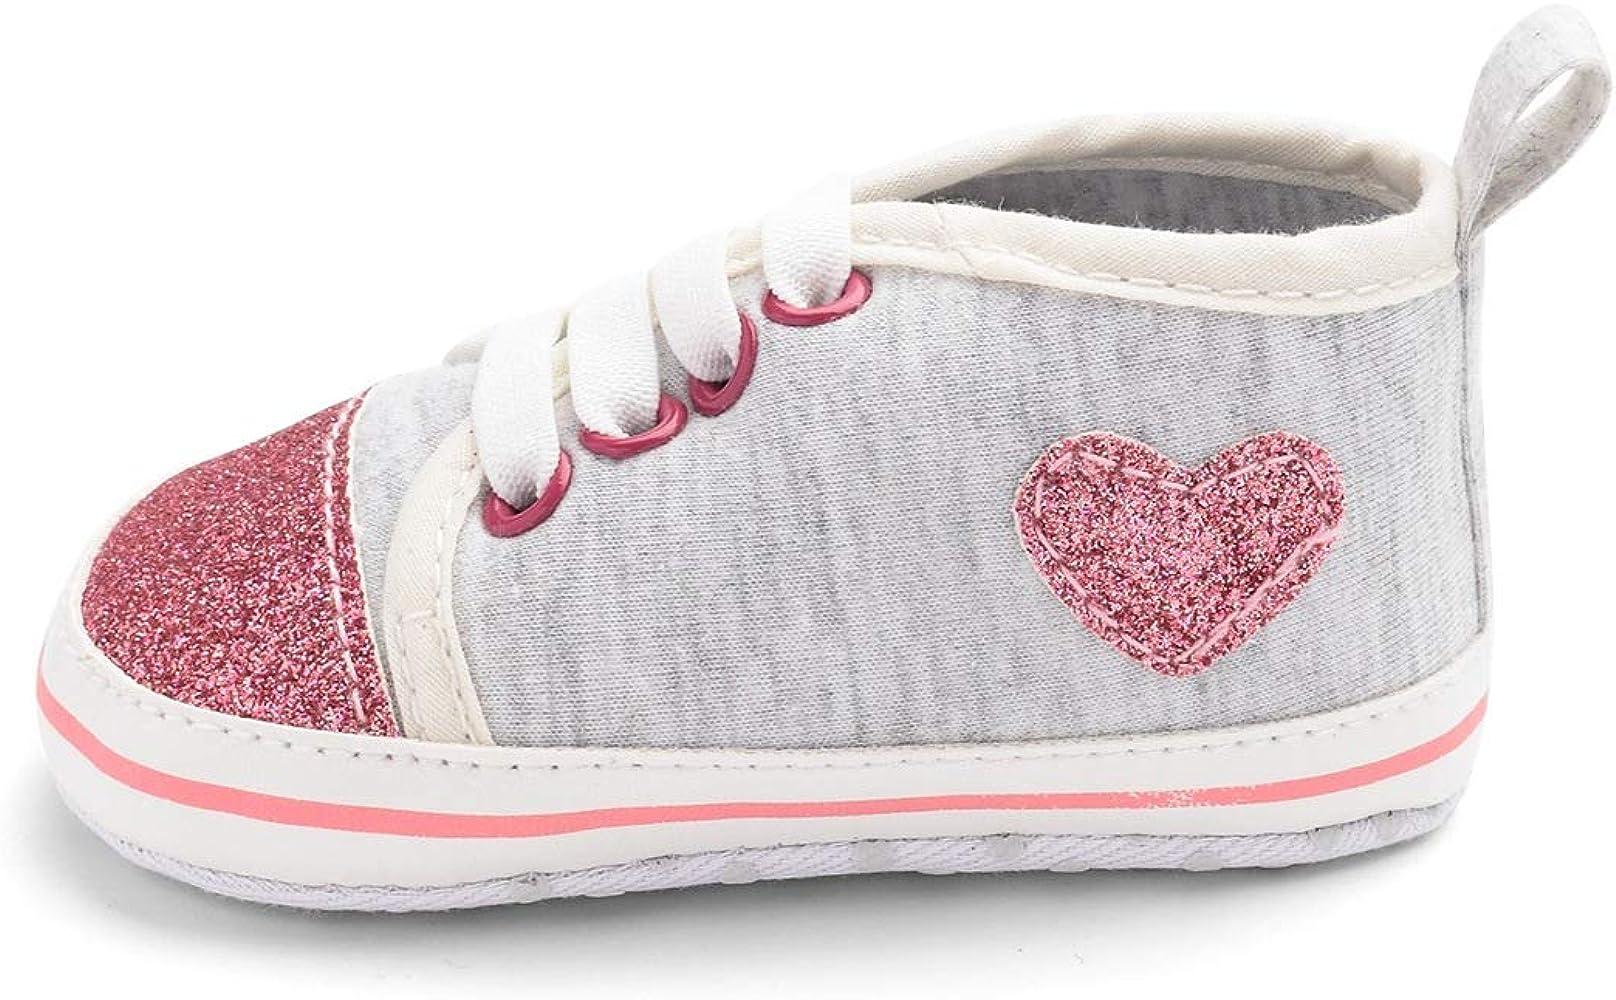 Zapatos de bebé brillante amor antideslizante corbata transpirable ...